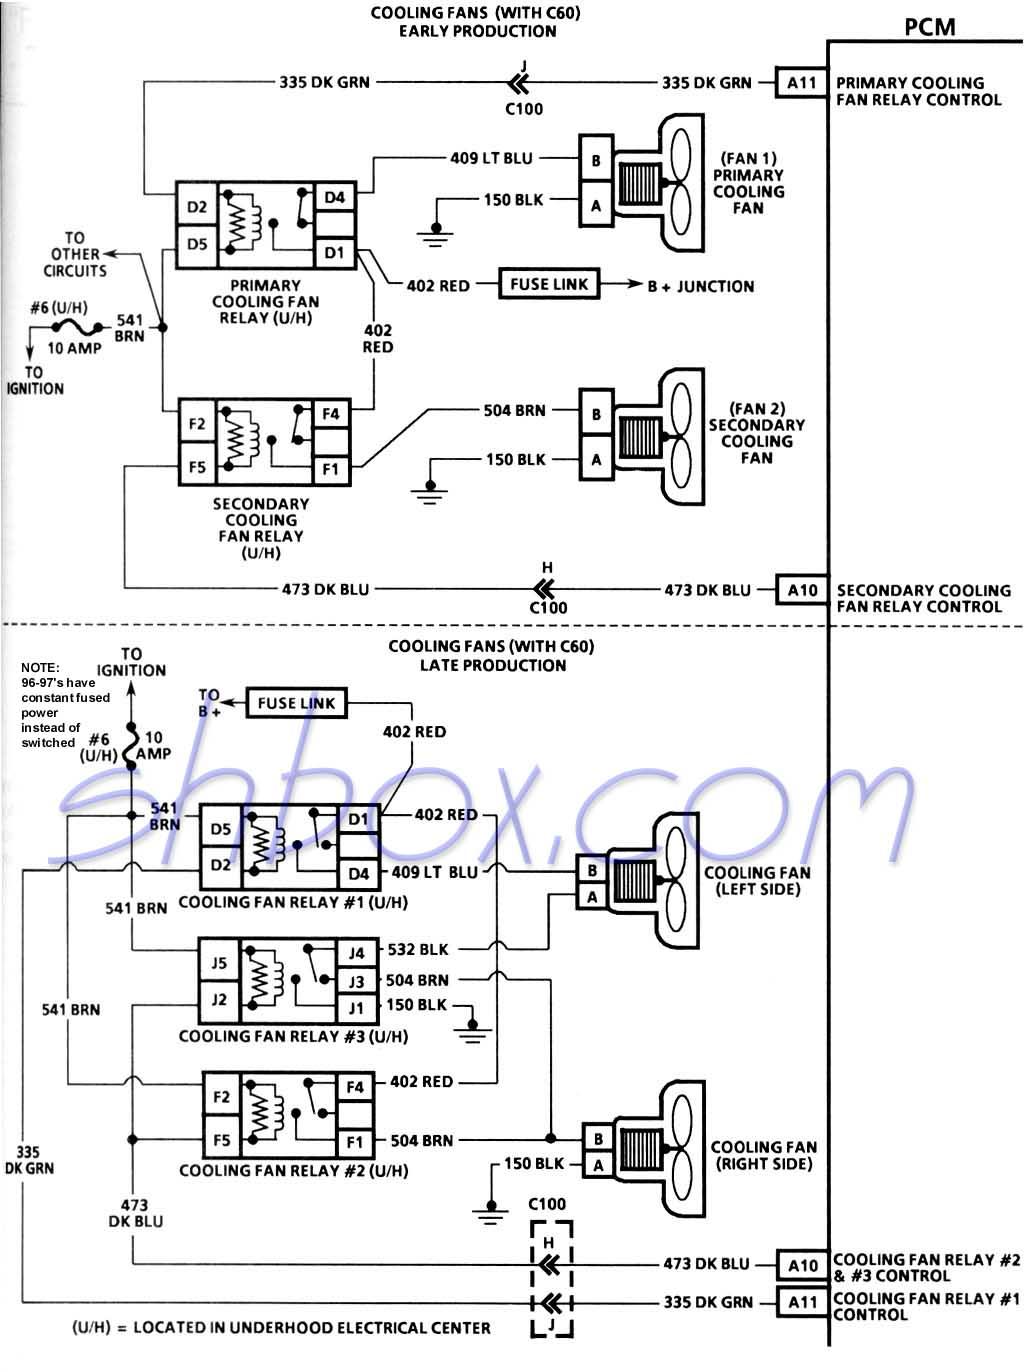 Na Miata Fuse Box Diagram Wiring Library 2001 Toyota Camry Location Mazda B2600 99 Cabrio Fuel Pump Relay